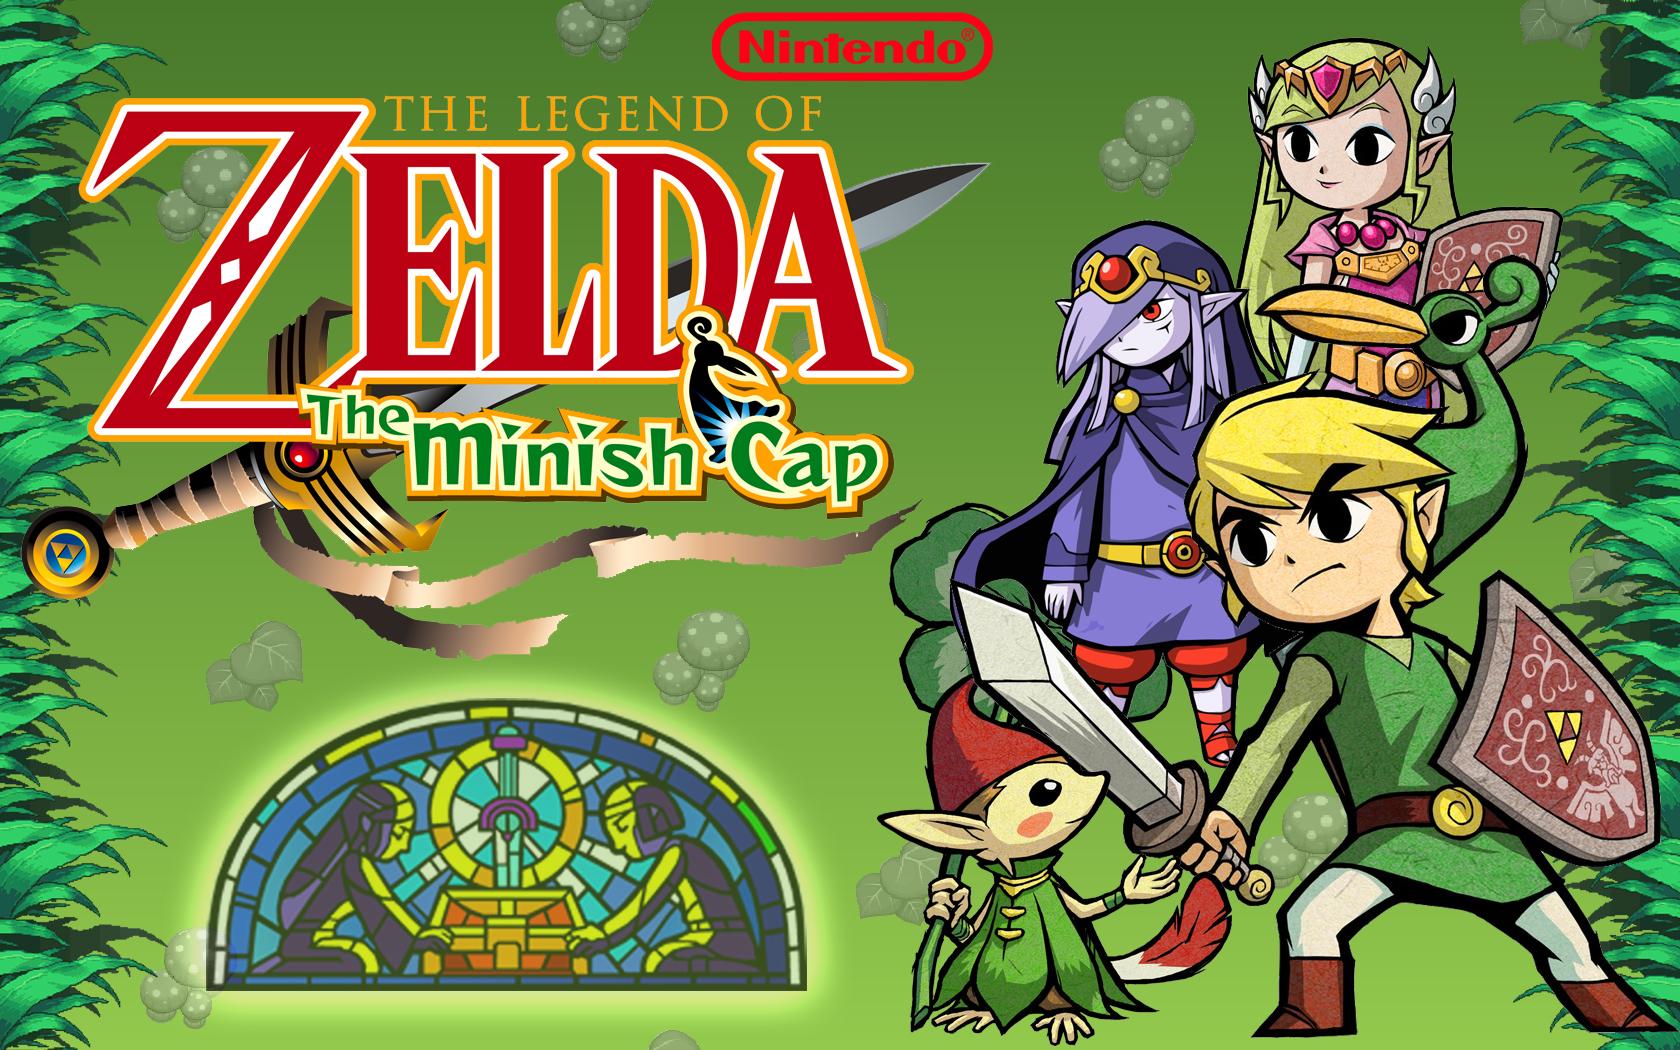 the legend of zelda the minish cap wallpaper and